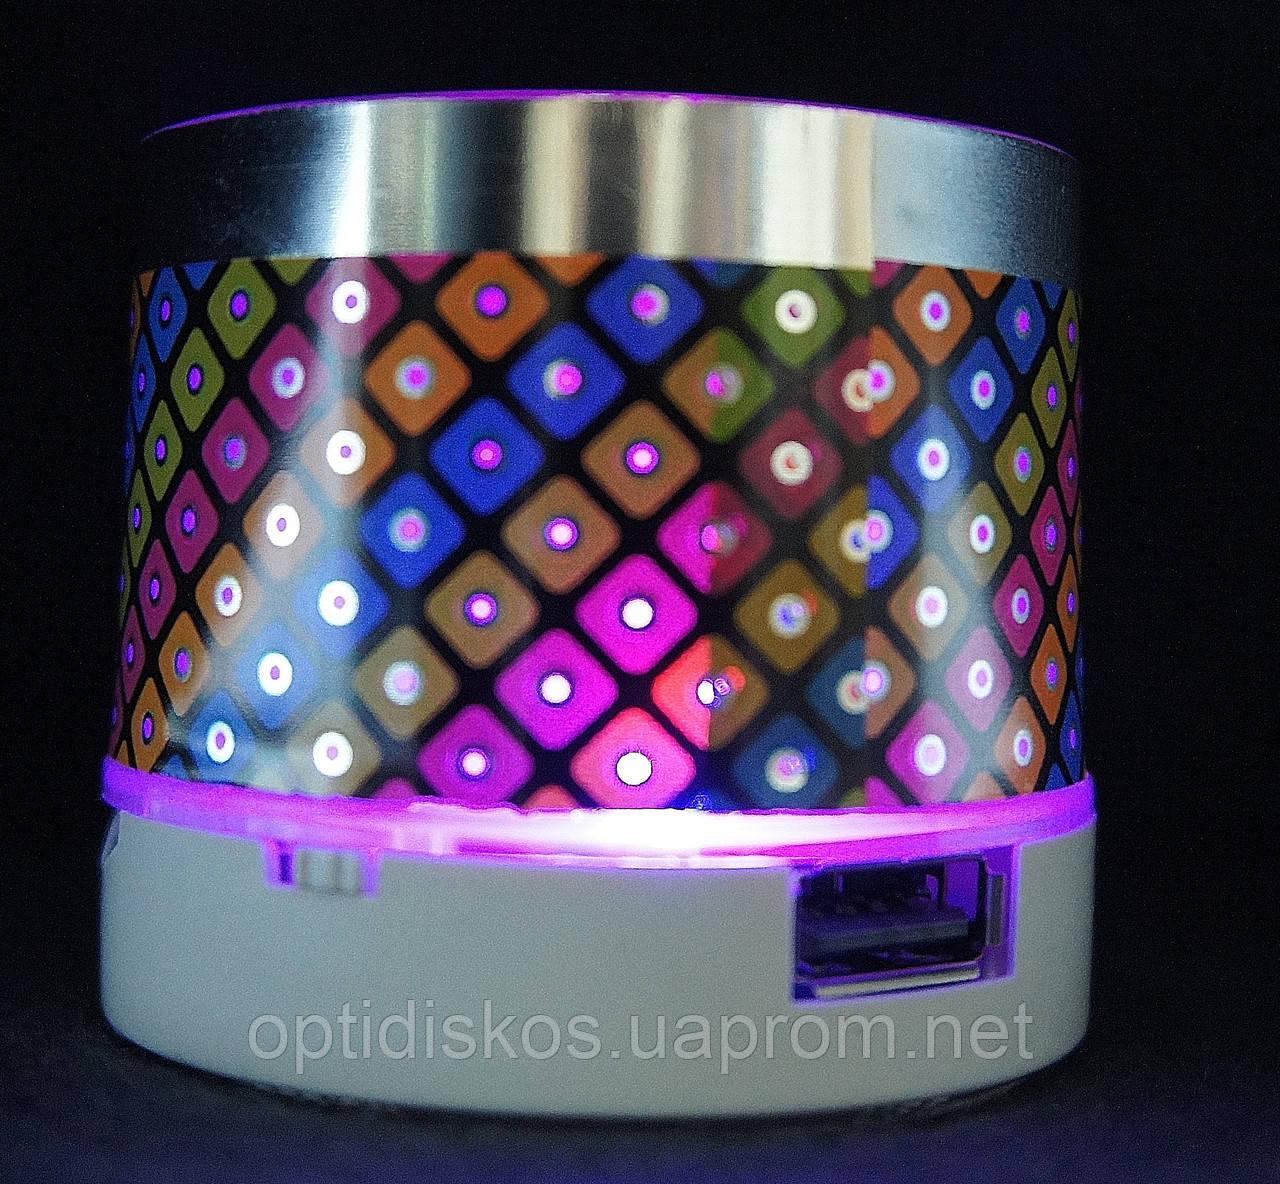 Bluetooth портативная колонка, S-10 LED, model-1